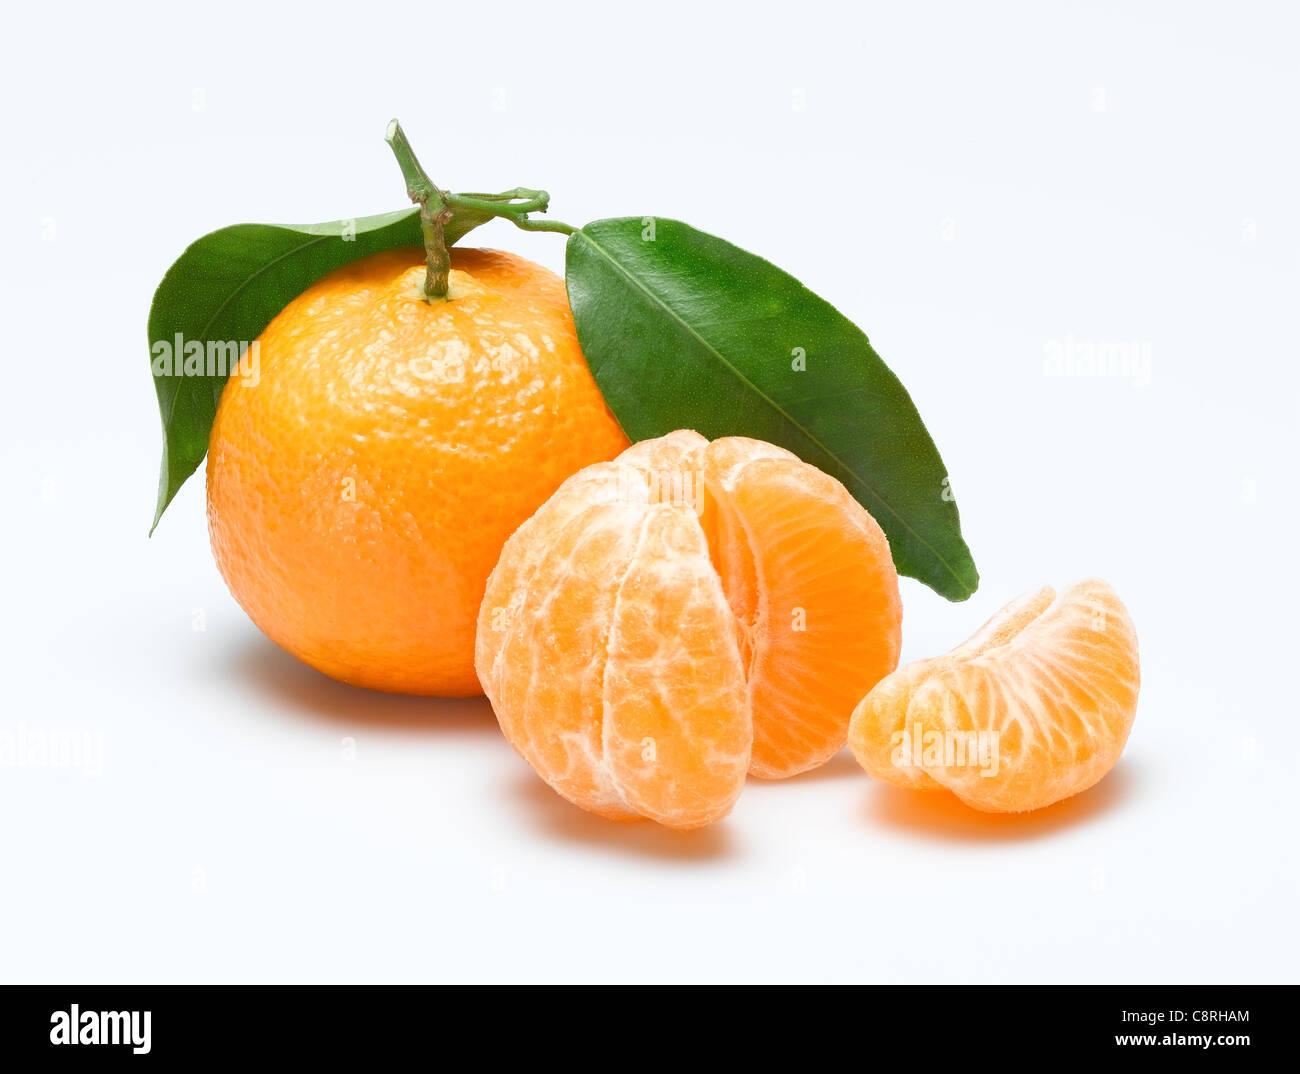 Mandarin orange - Stock Image